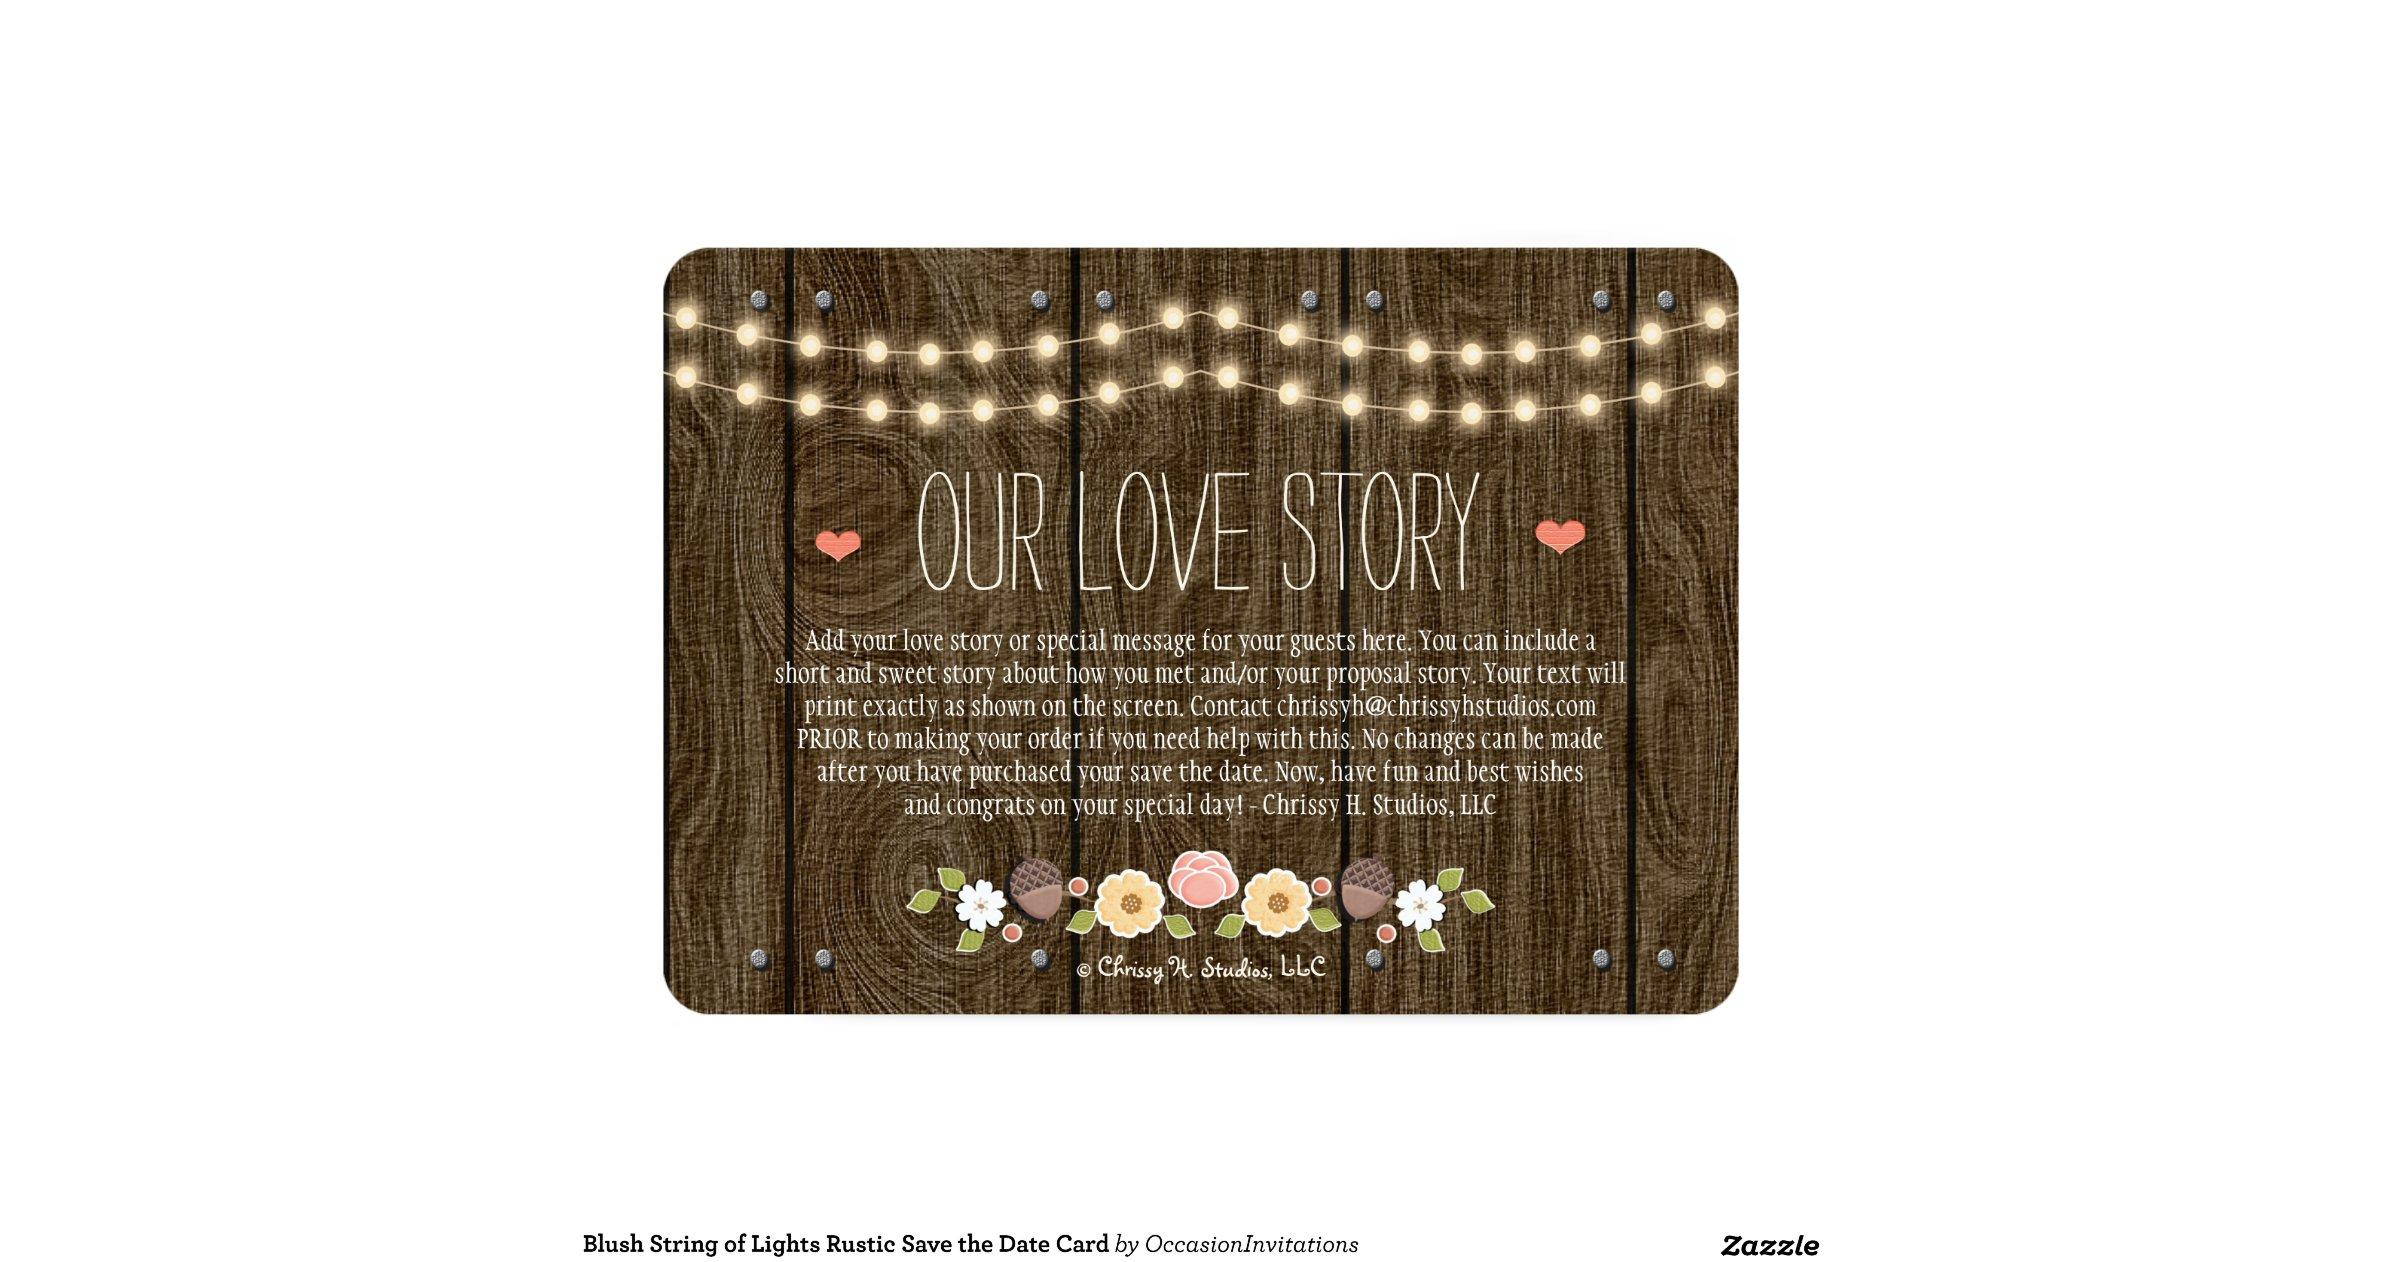 blush_string_of_lights_rustic_save_the_date_card-r72a70c26f9894dbc8c905632aafa88c6_zk9g4_1200 ...